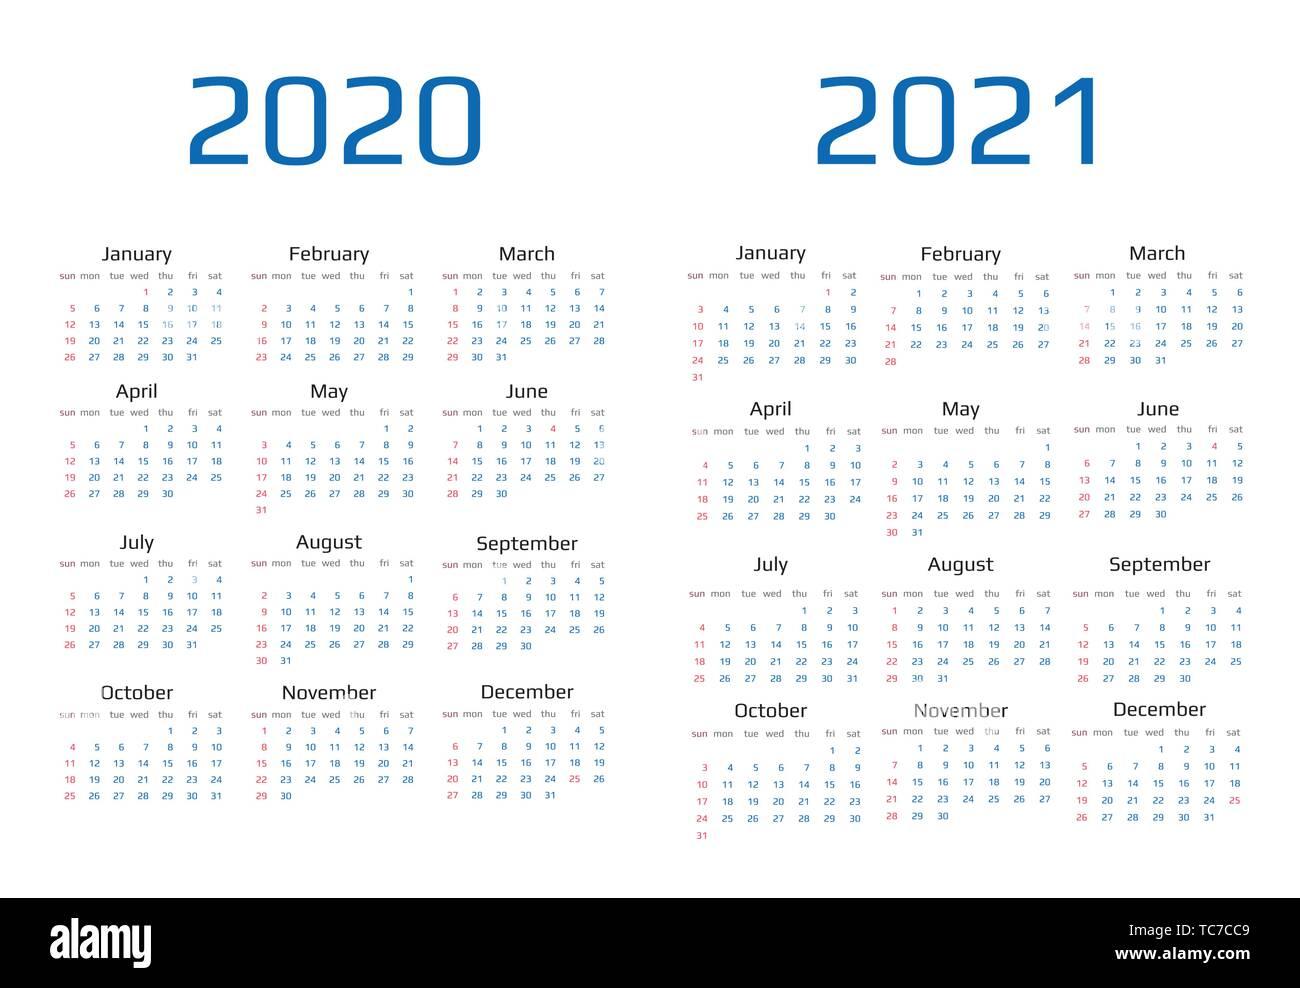 Urlaub Juni 2021